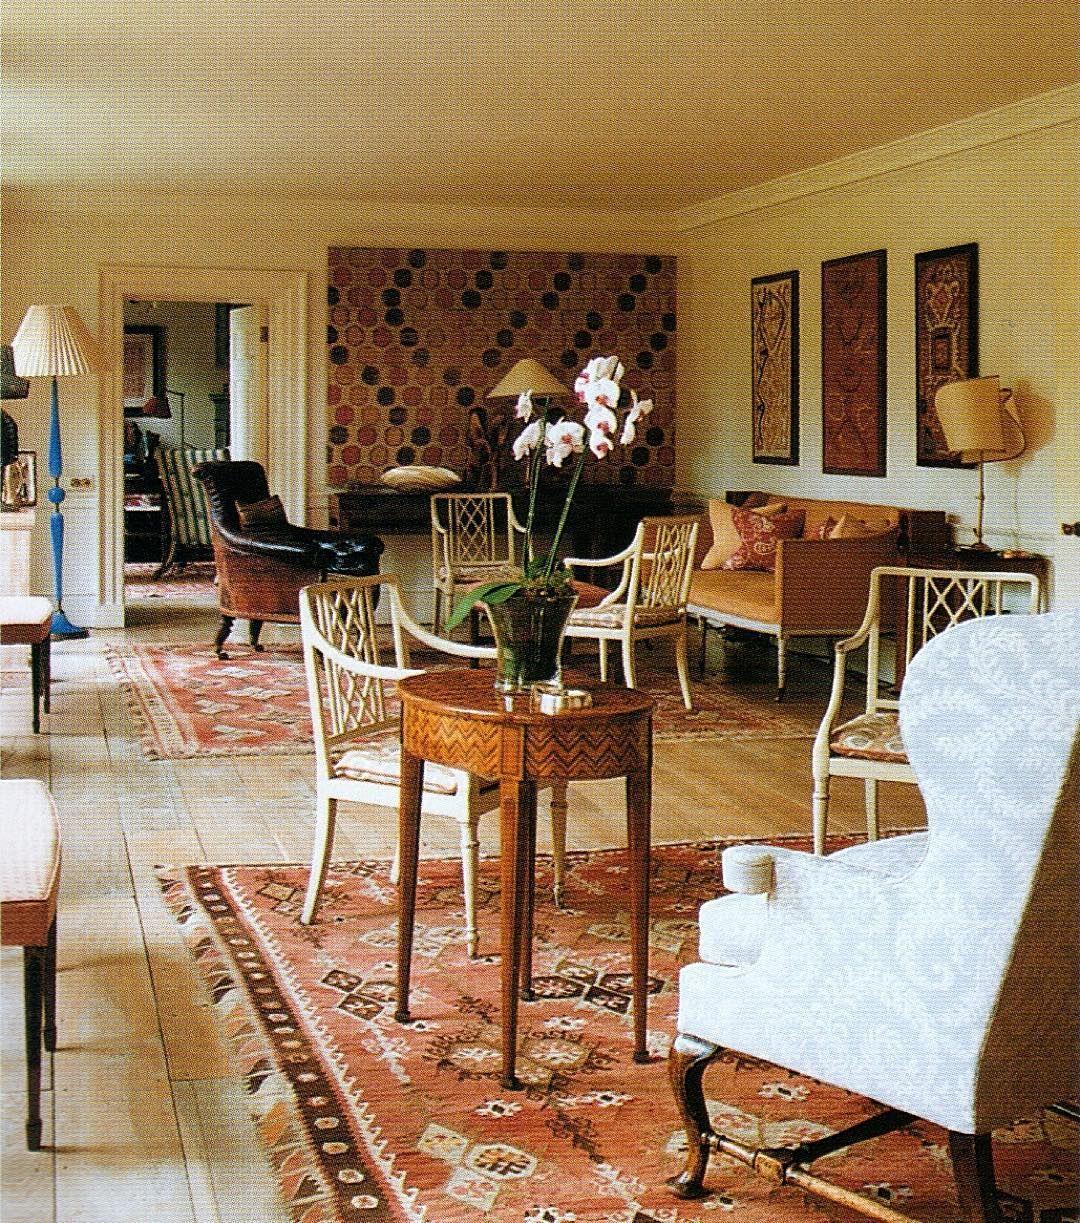 Randal Dawkins On Instagram The Long Room At Aubrey House Holland Park London Originally Named N Hygge Home Interiors Long Room English Interior Design